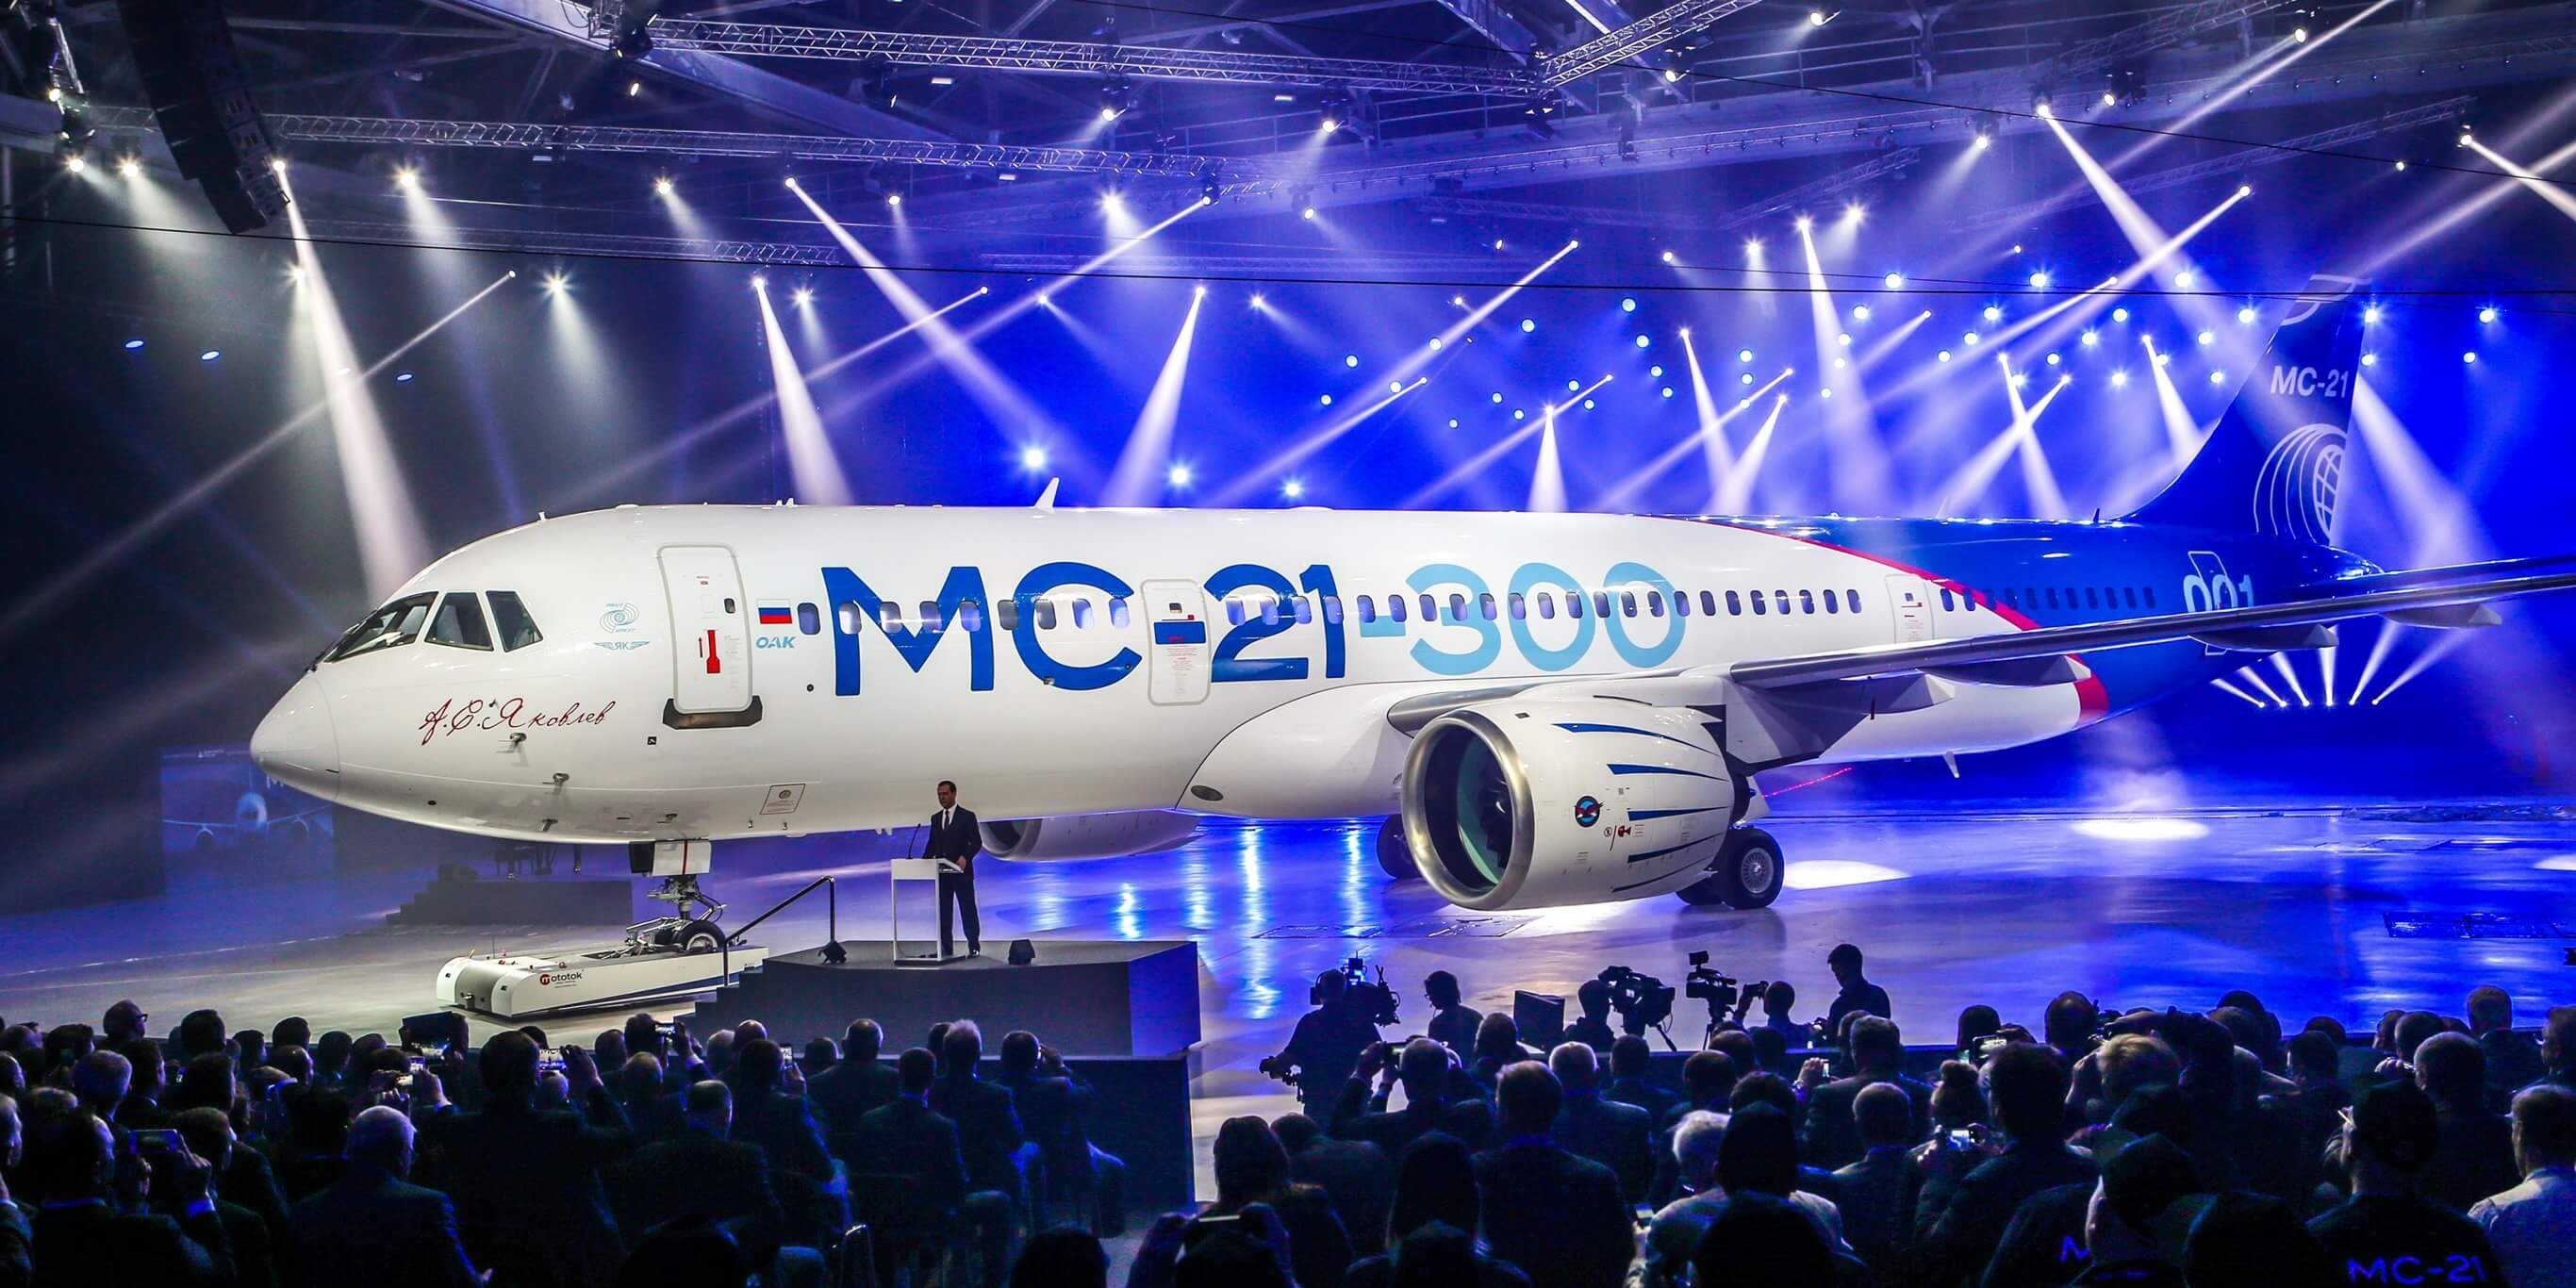 Russian MC-21 passenger jet will make its public debut at MAKS-2019 air show